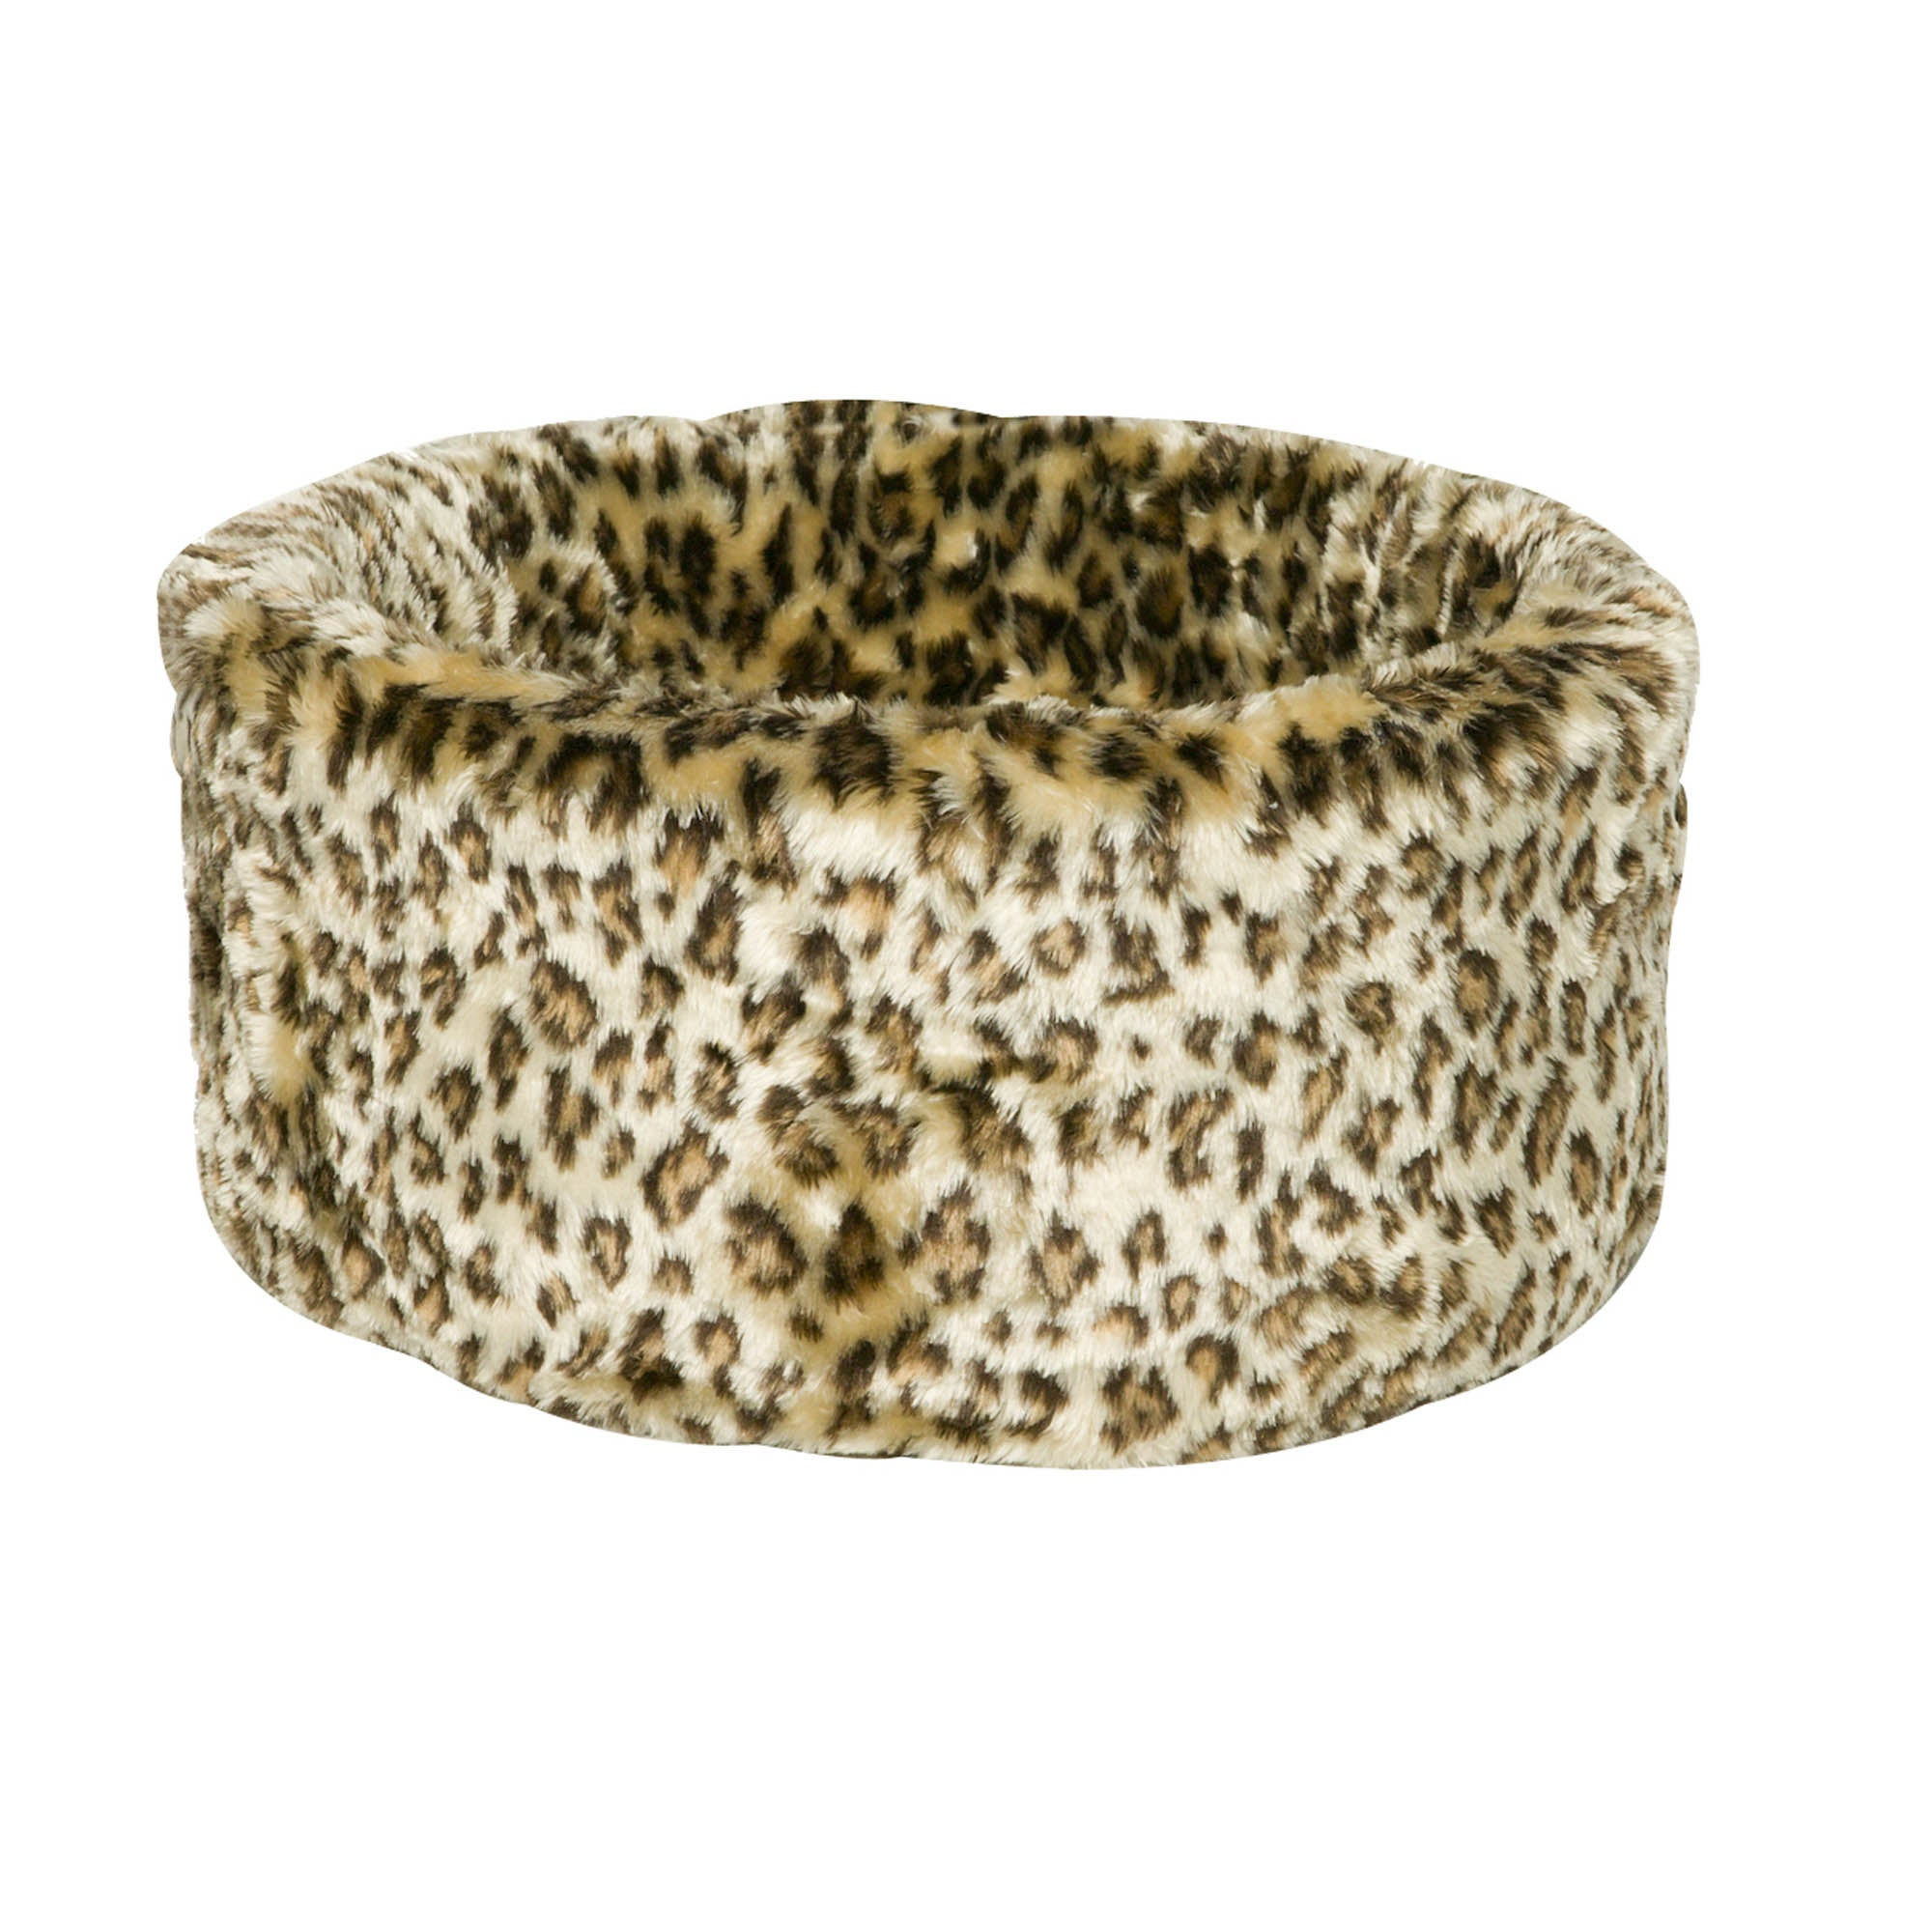 Leopard Print Cosy Cat Bed Almond (Cream)